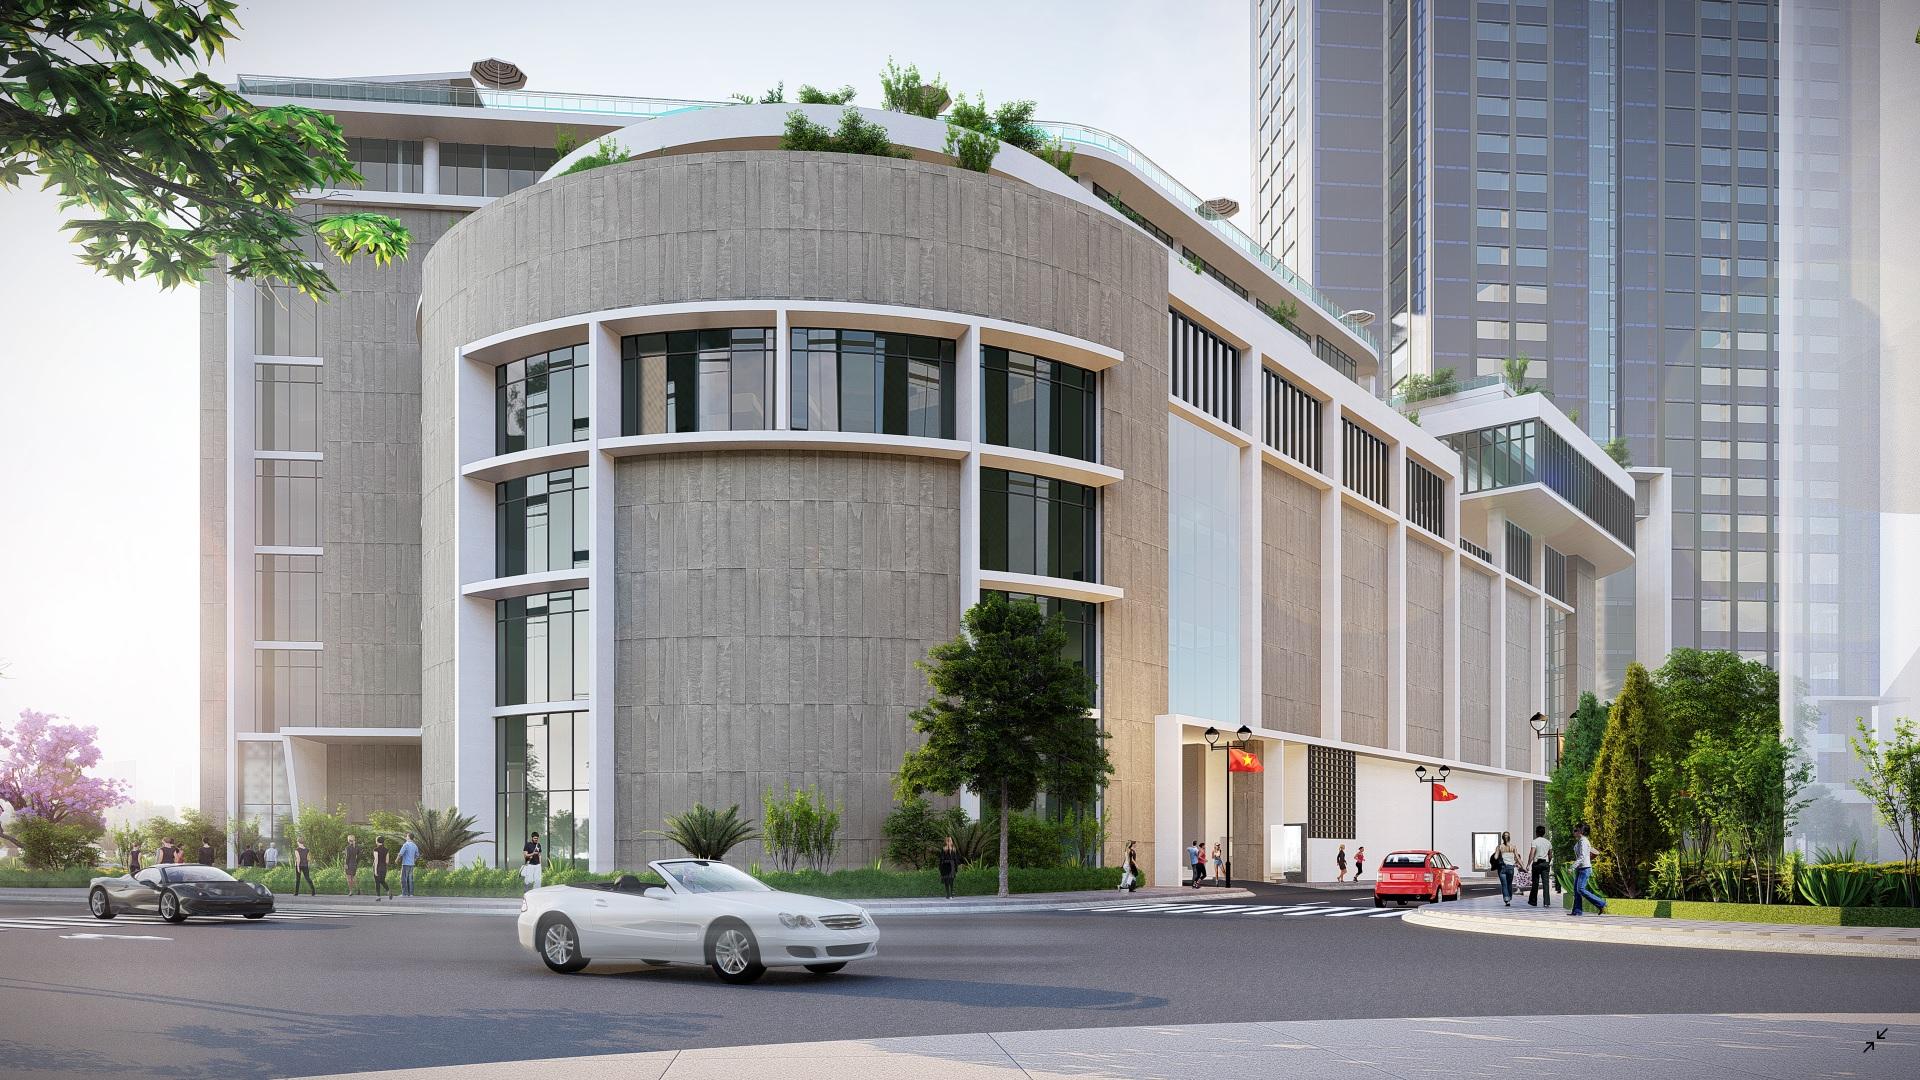 khach san park hyatt va aeon mail du an ecogreen saigon - Penthouse là gì? Tiêu chí của căn hộ Penthouse